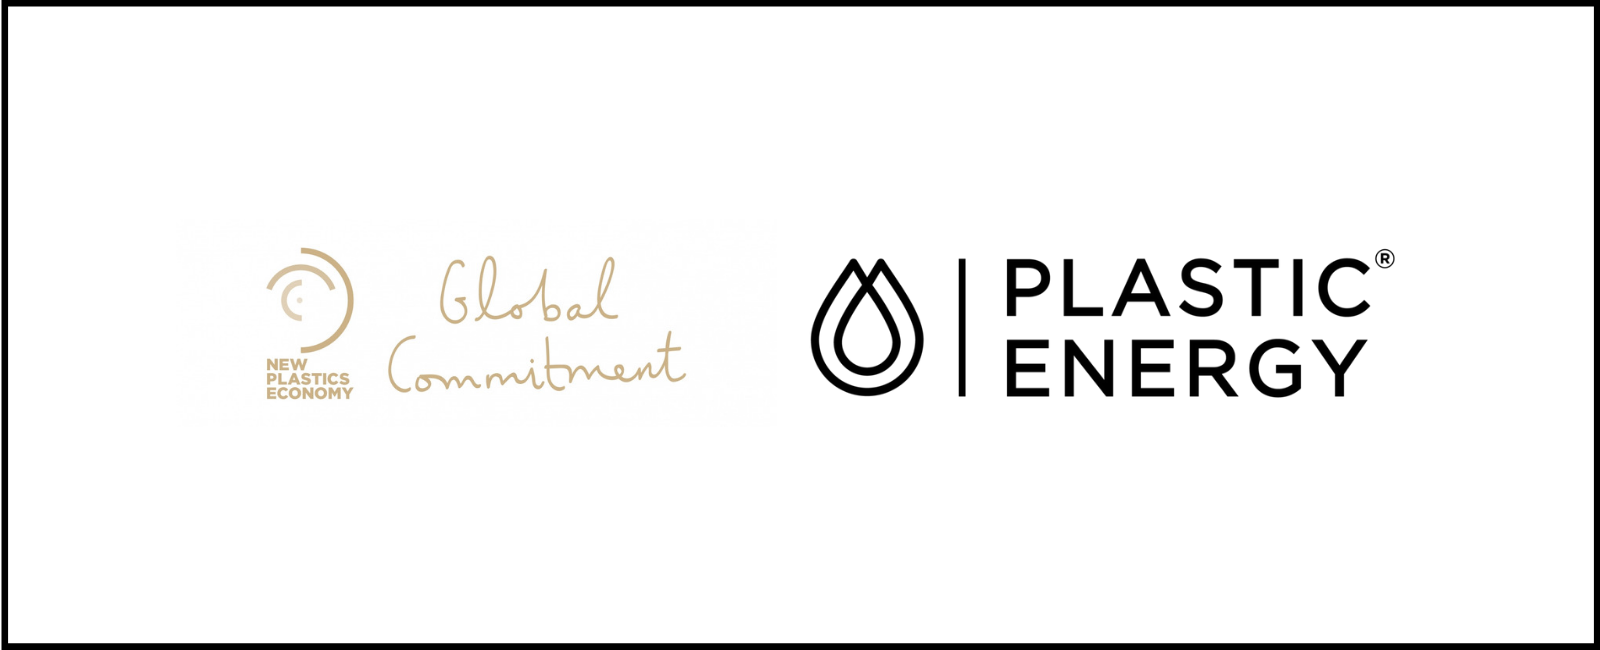 PRESS RELEASE: Global Commitment Ellen MacArthur Foundation